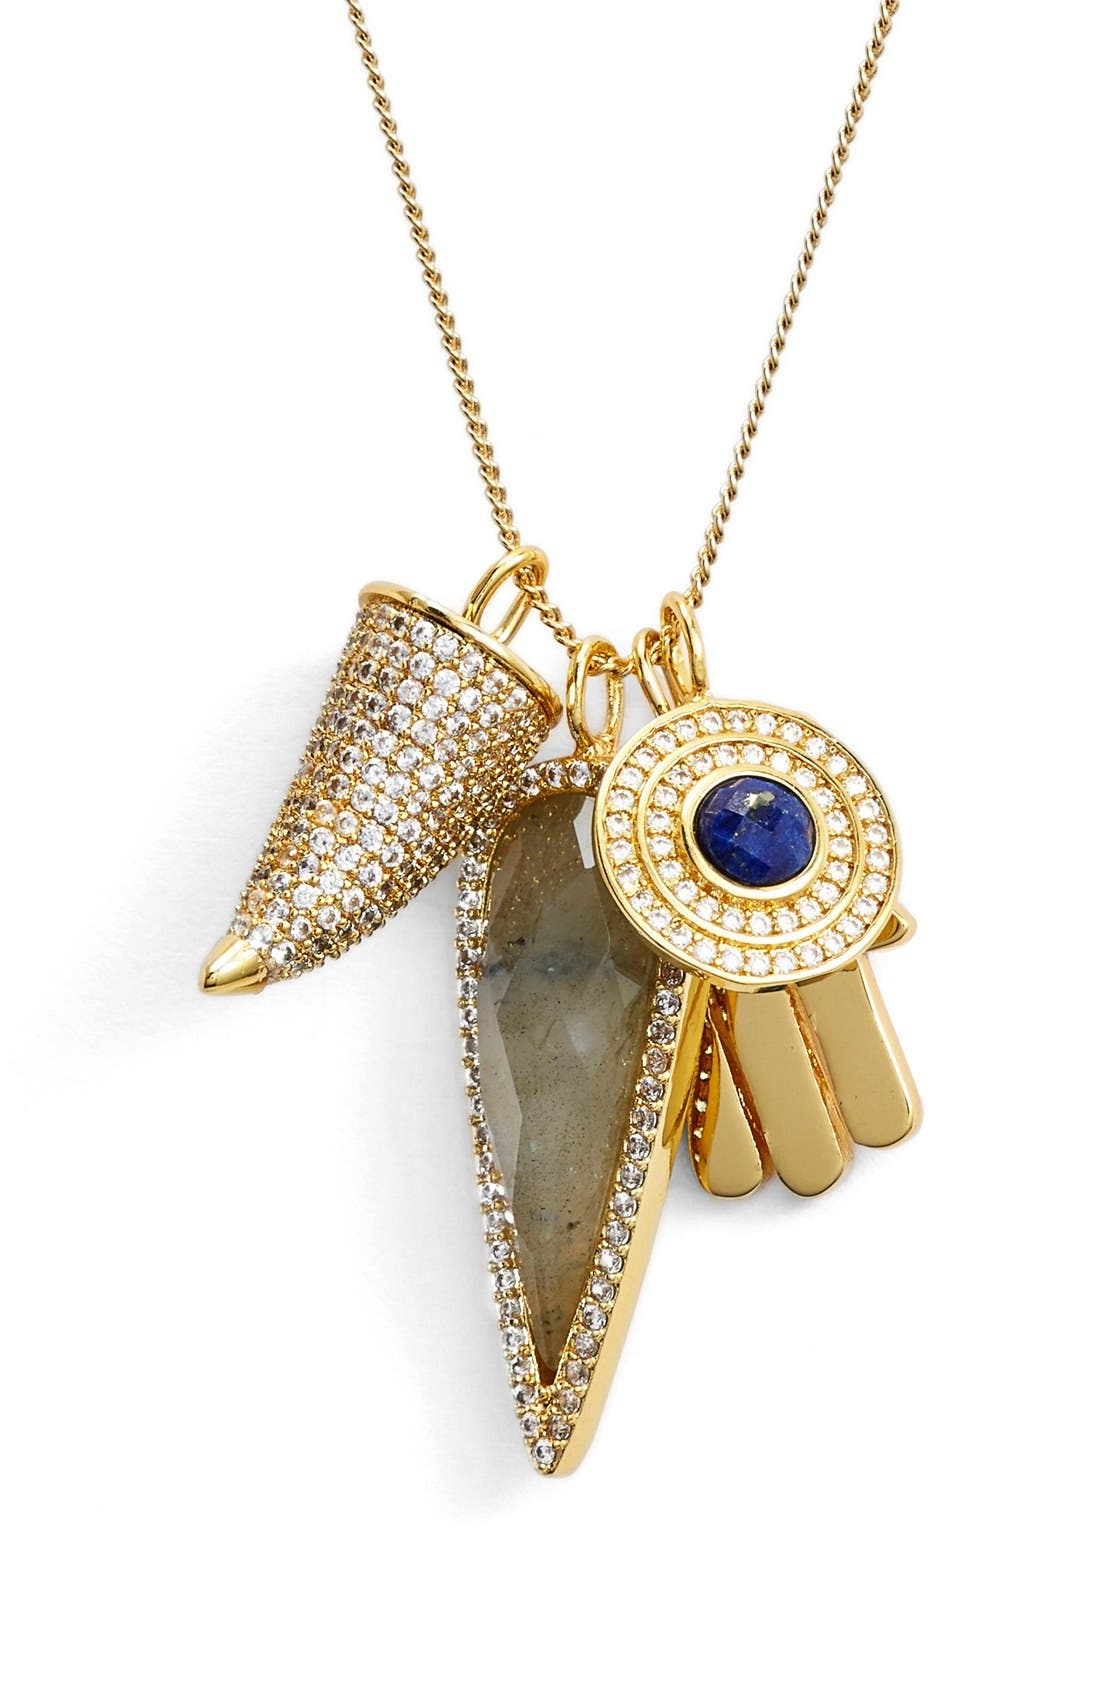 Main Image - Melanie Auld'Protection' Charm Necklace